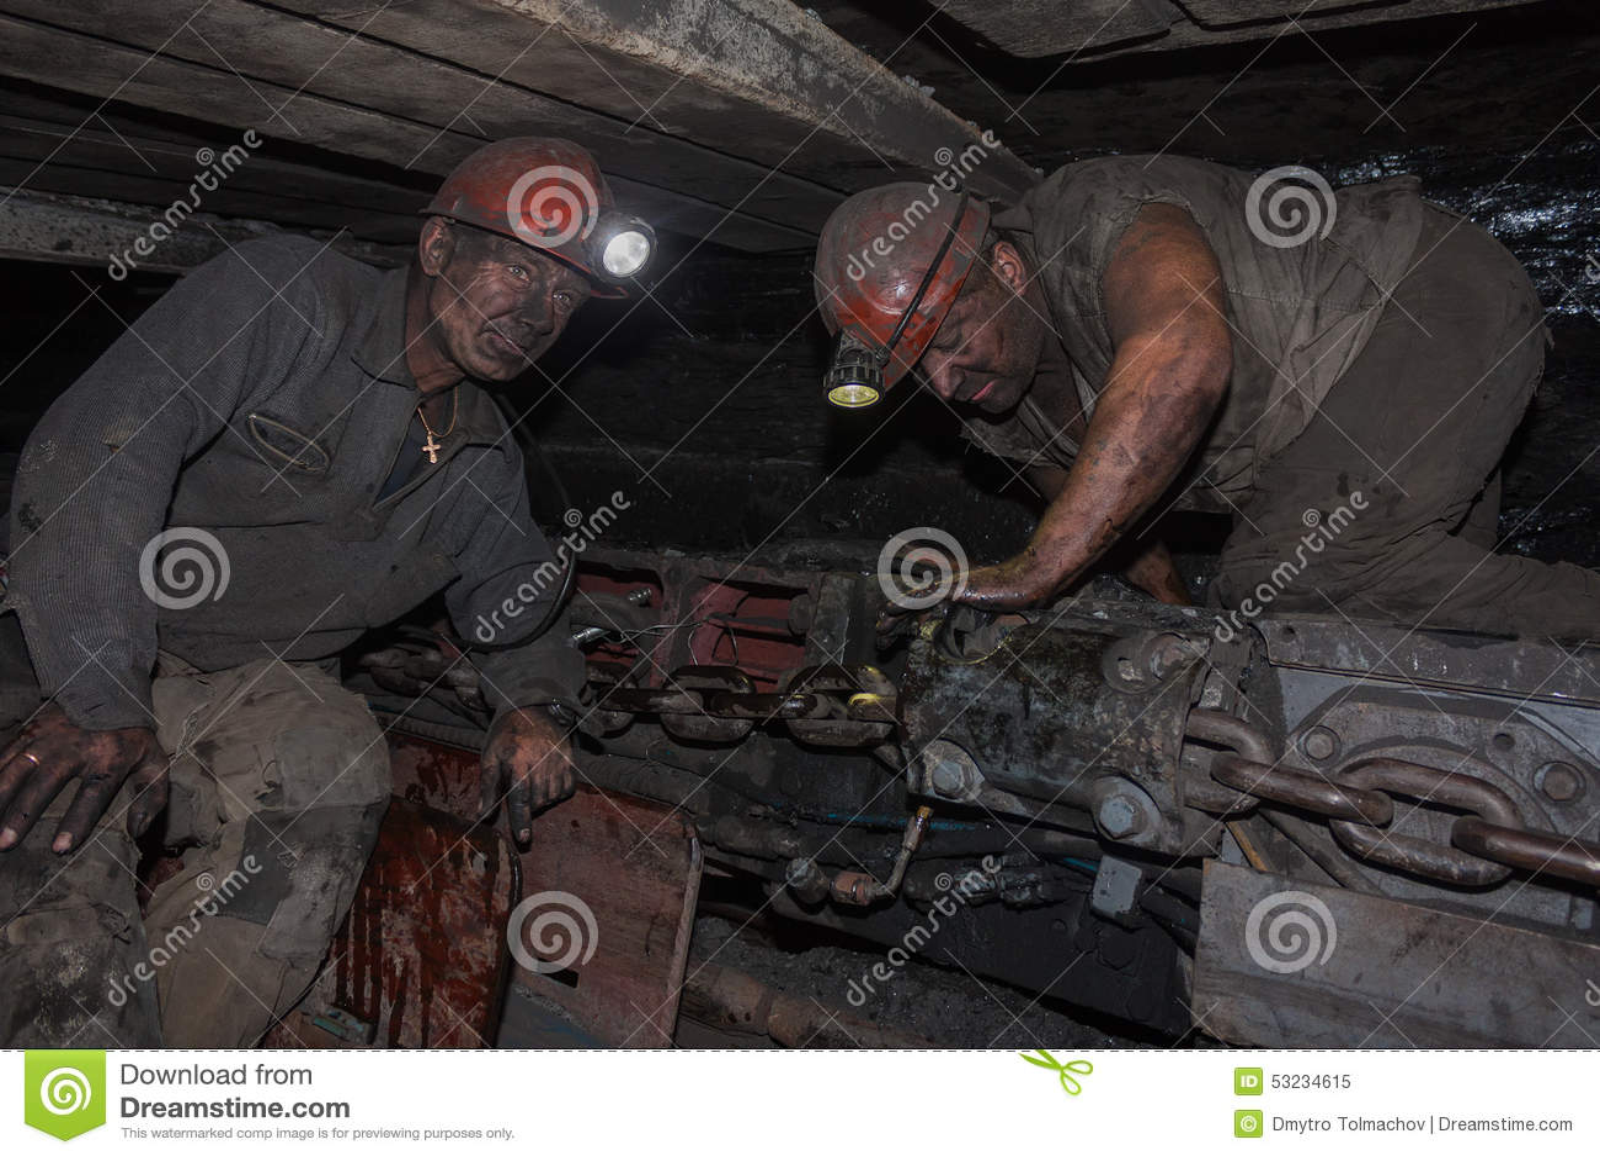 Donetsk, Ukraine - August, 16, 2013: Bergmänner nahe dem Kohlenbergbau